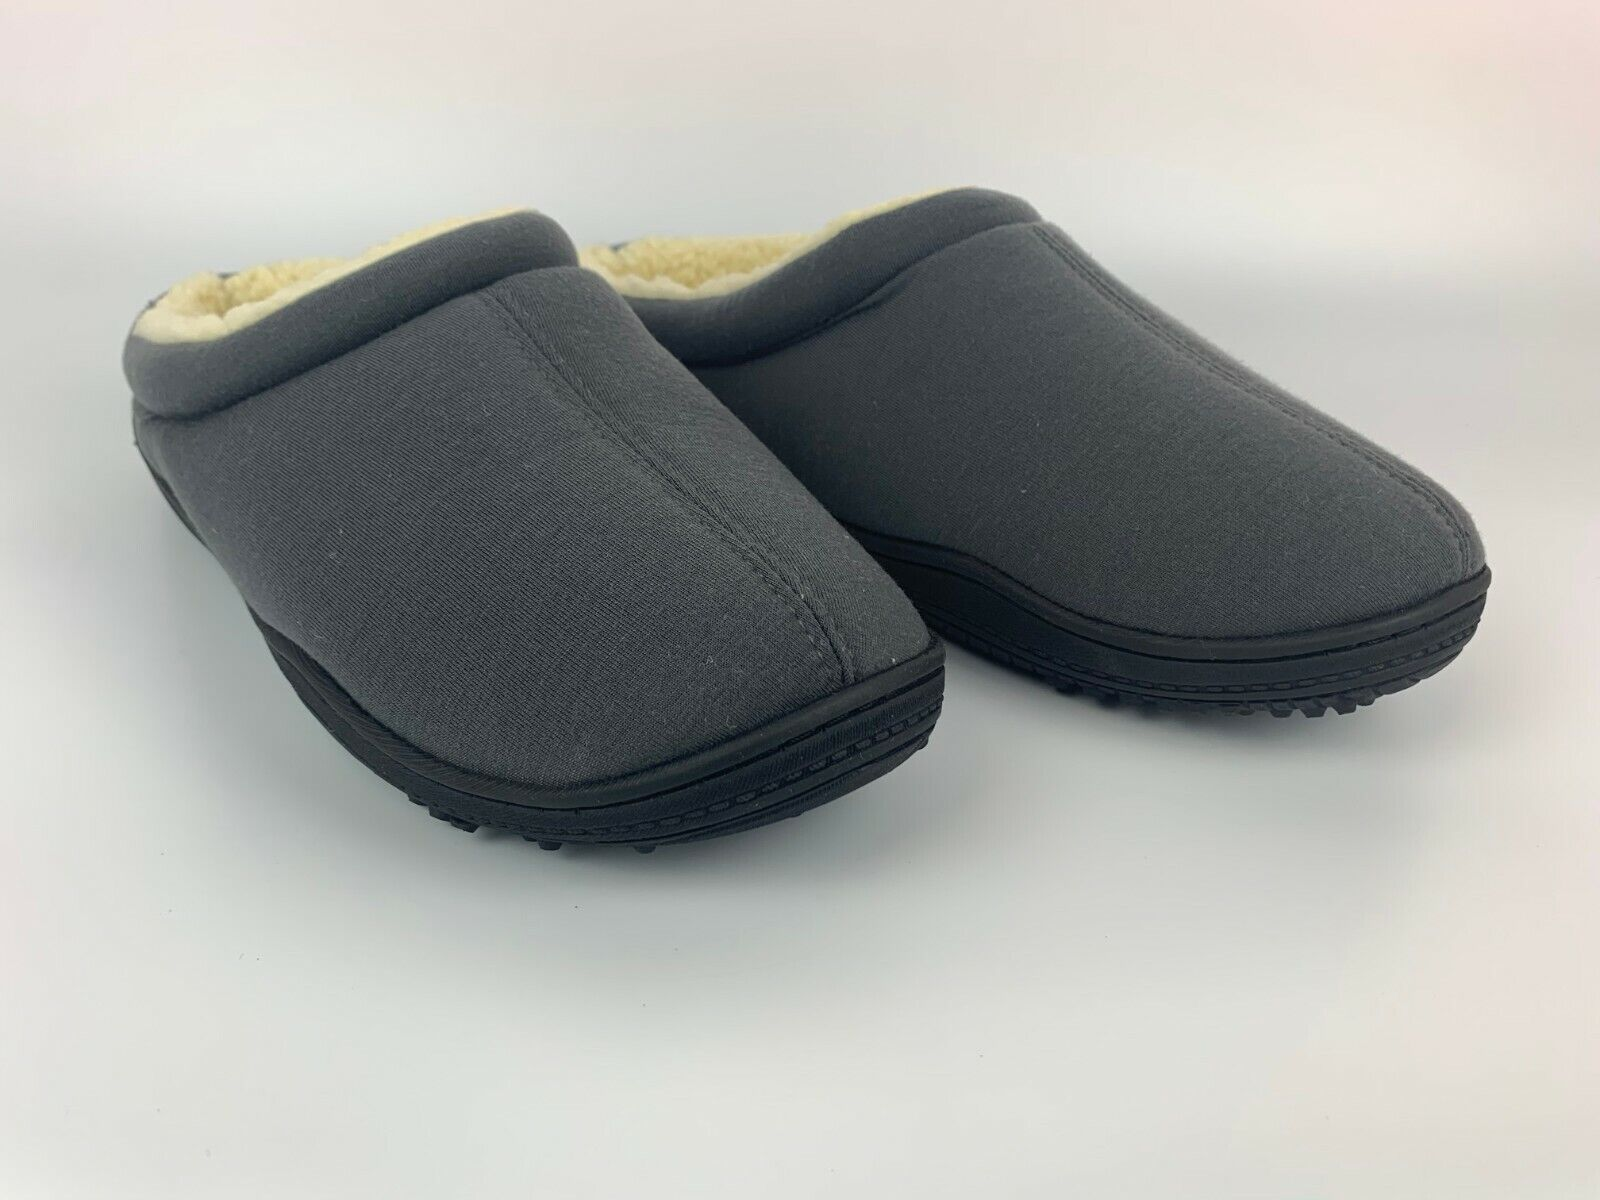 Men's Memory Foam Slippers Wool-Like Comfortable Home House